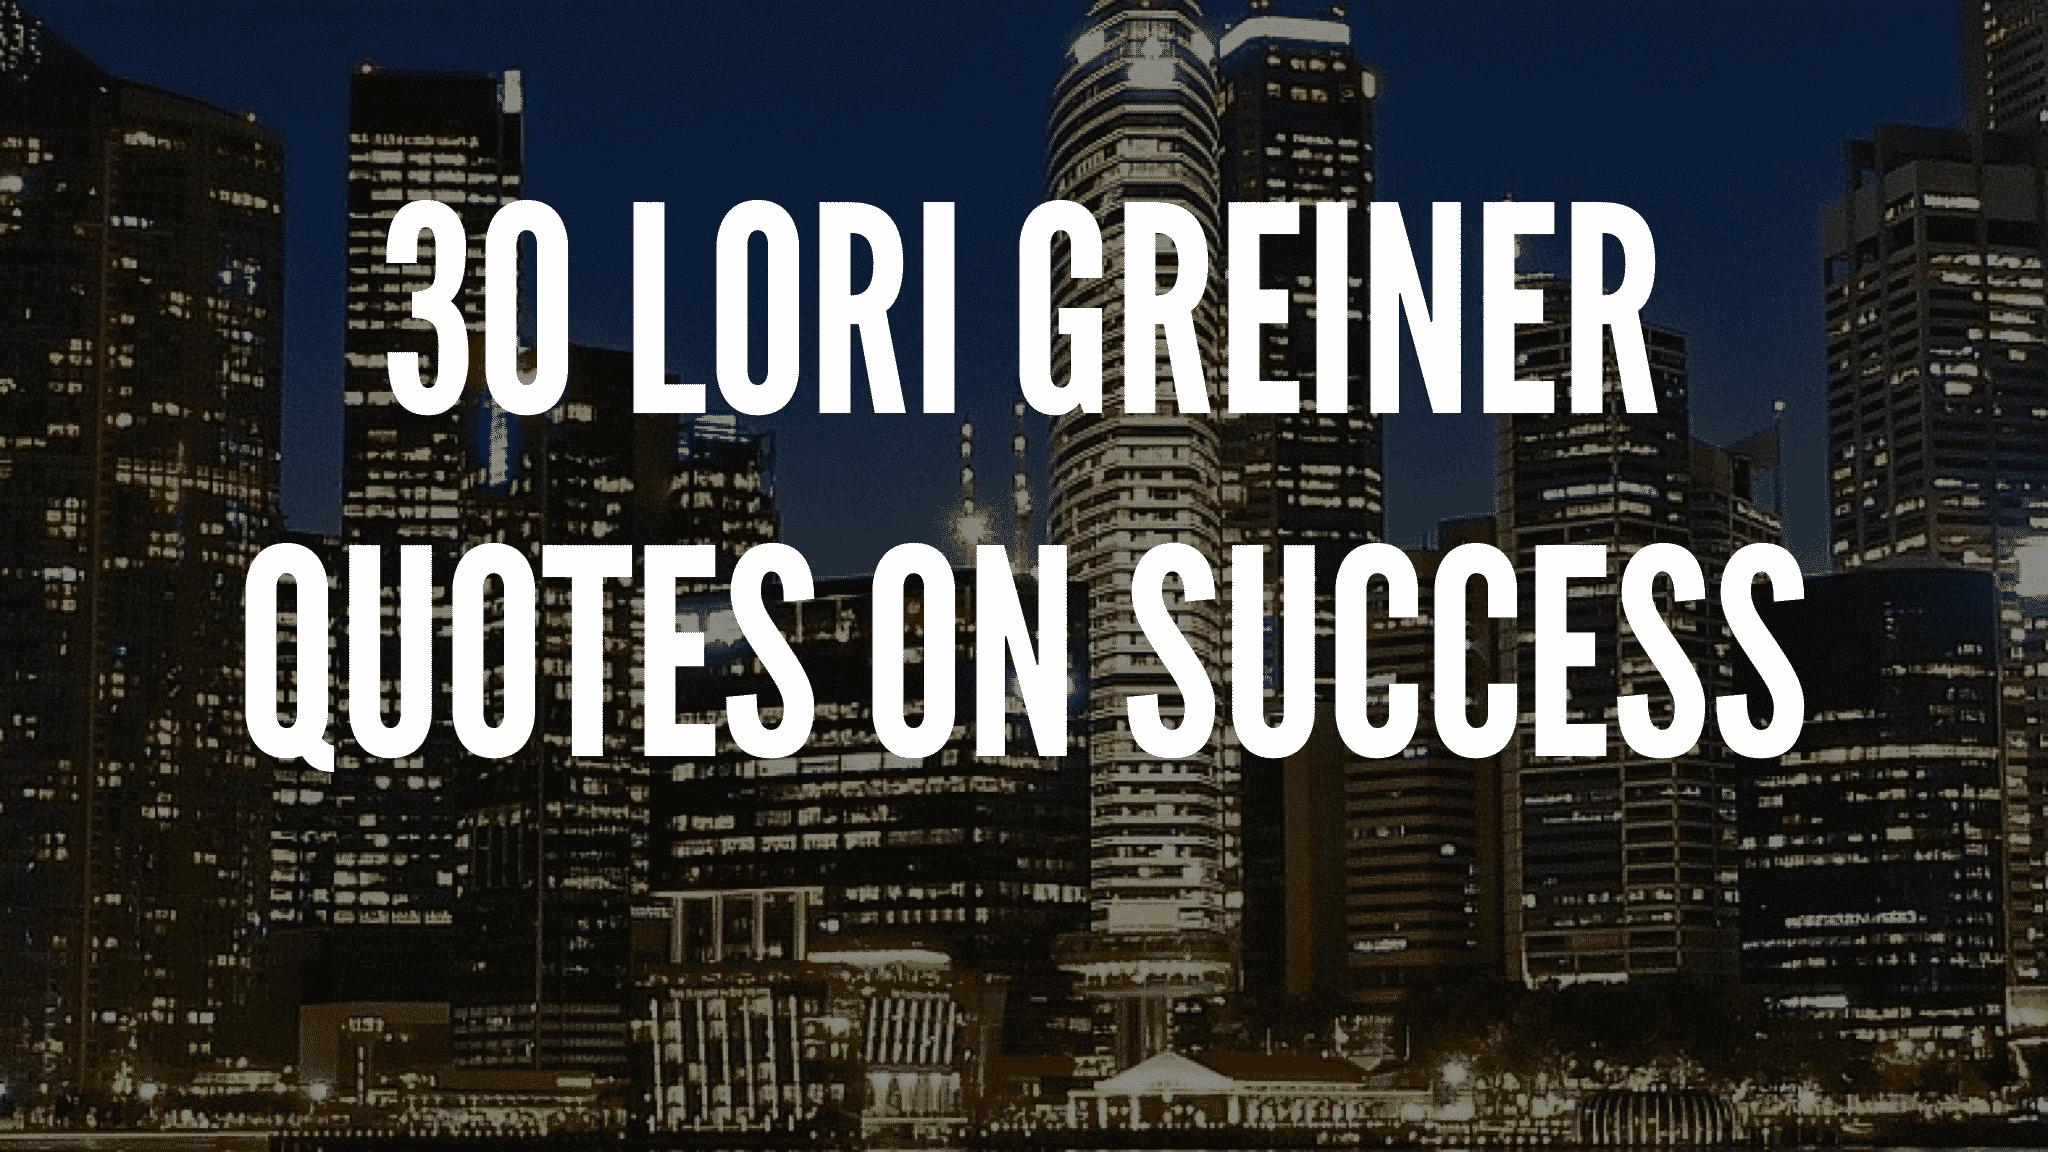 30 Inspirational Lori Greiner Quotes on Success